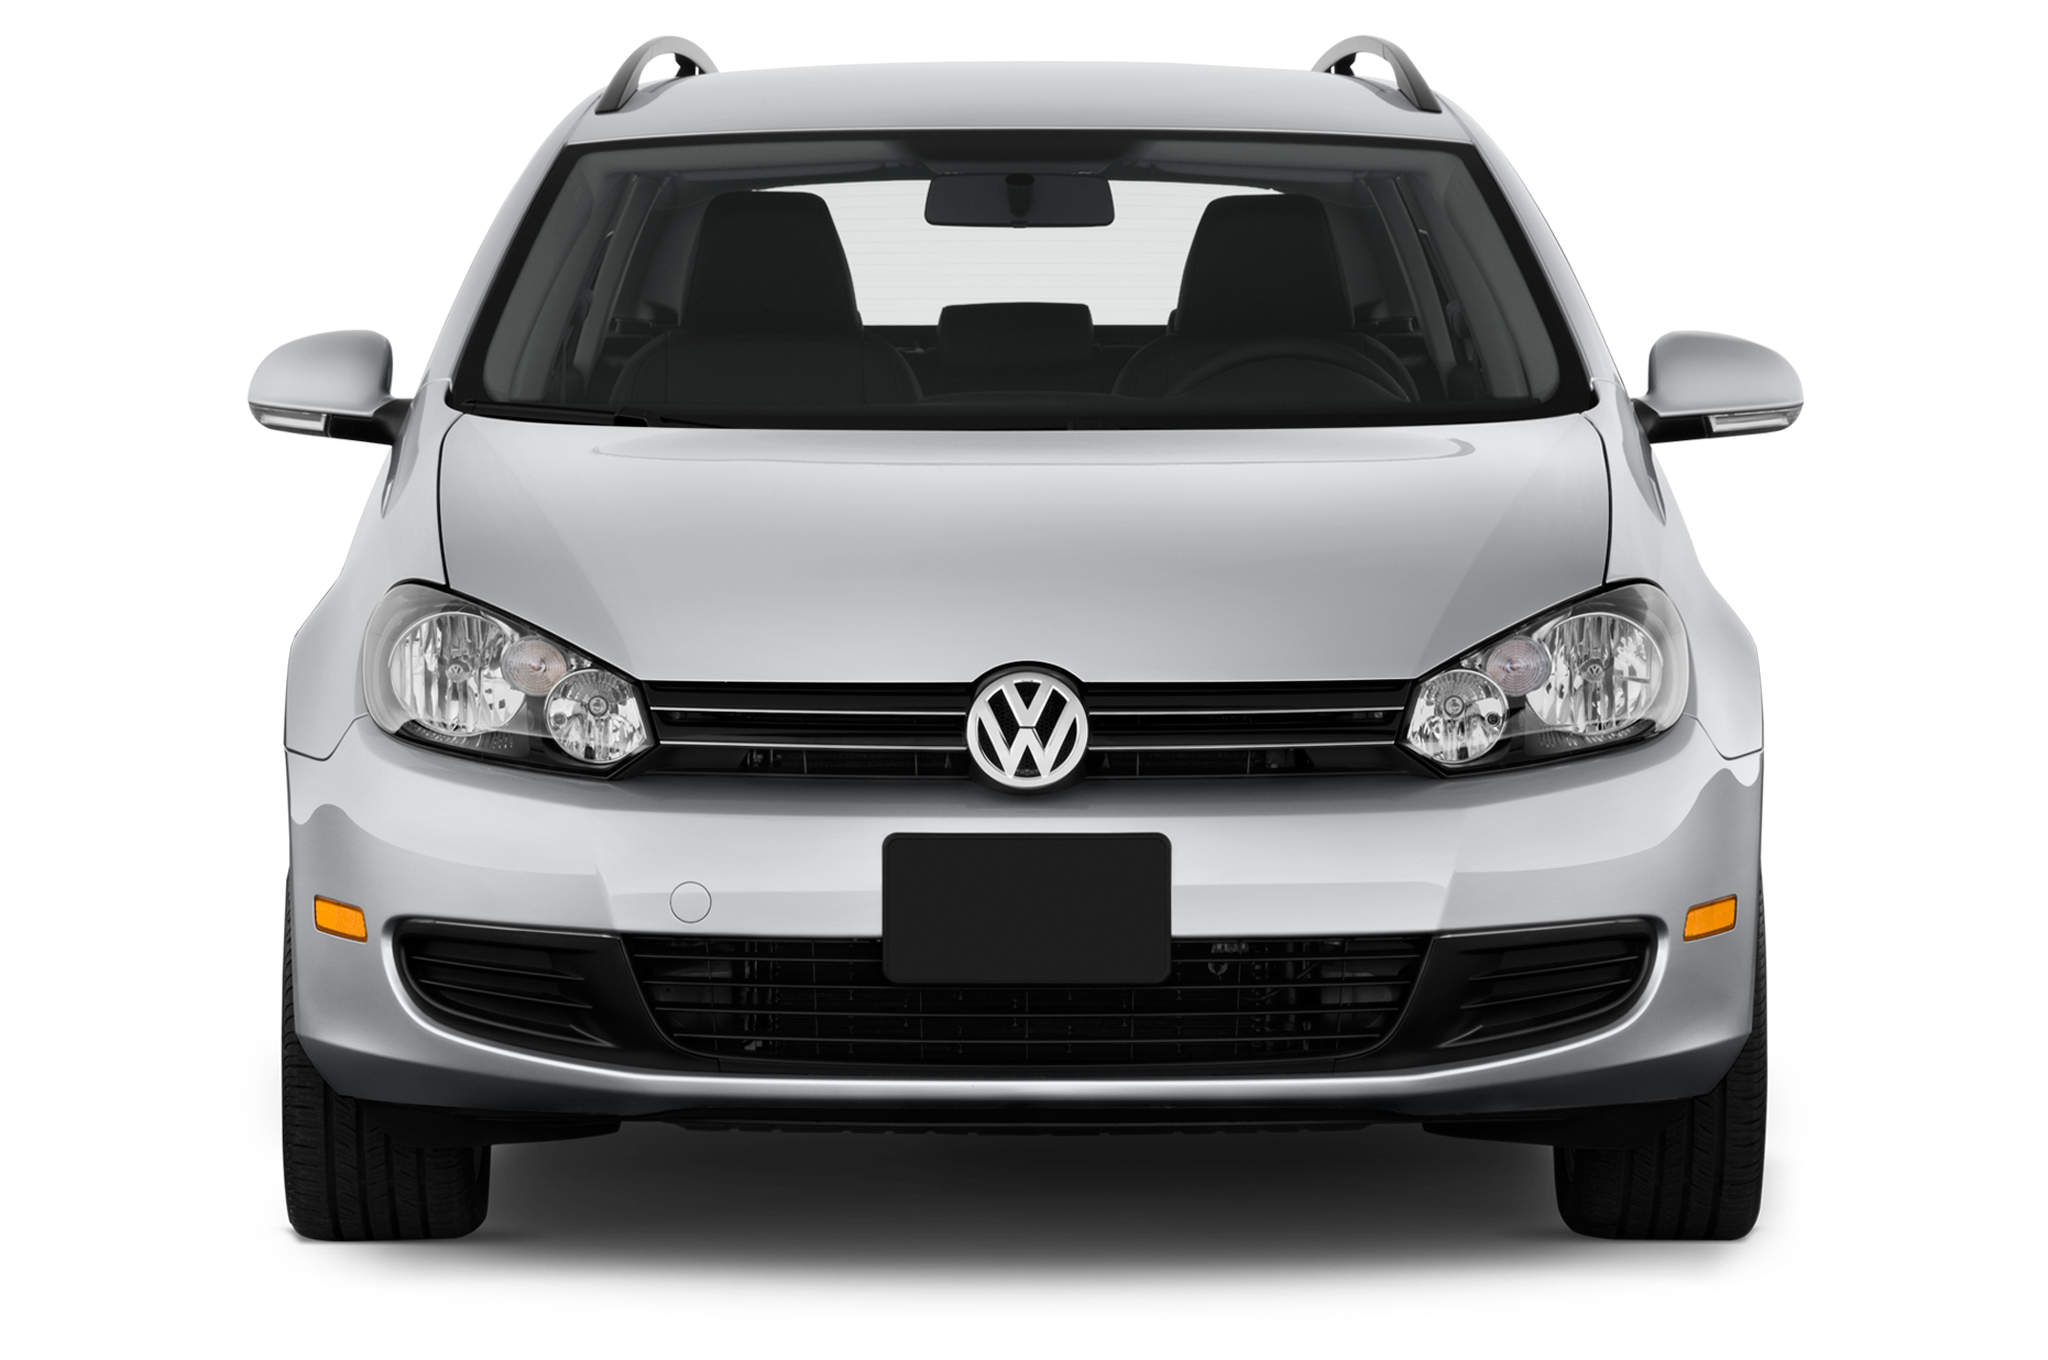 2010 volkswagen jetta sportwagen tdi vw midsize sports wagon review automobile magazine. Black Bedroom Furniture Sets. Home Design Ideas